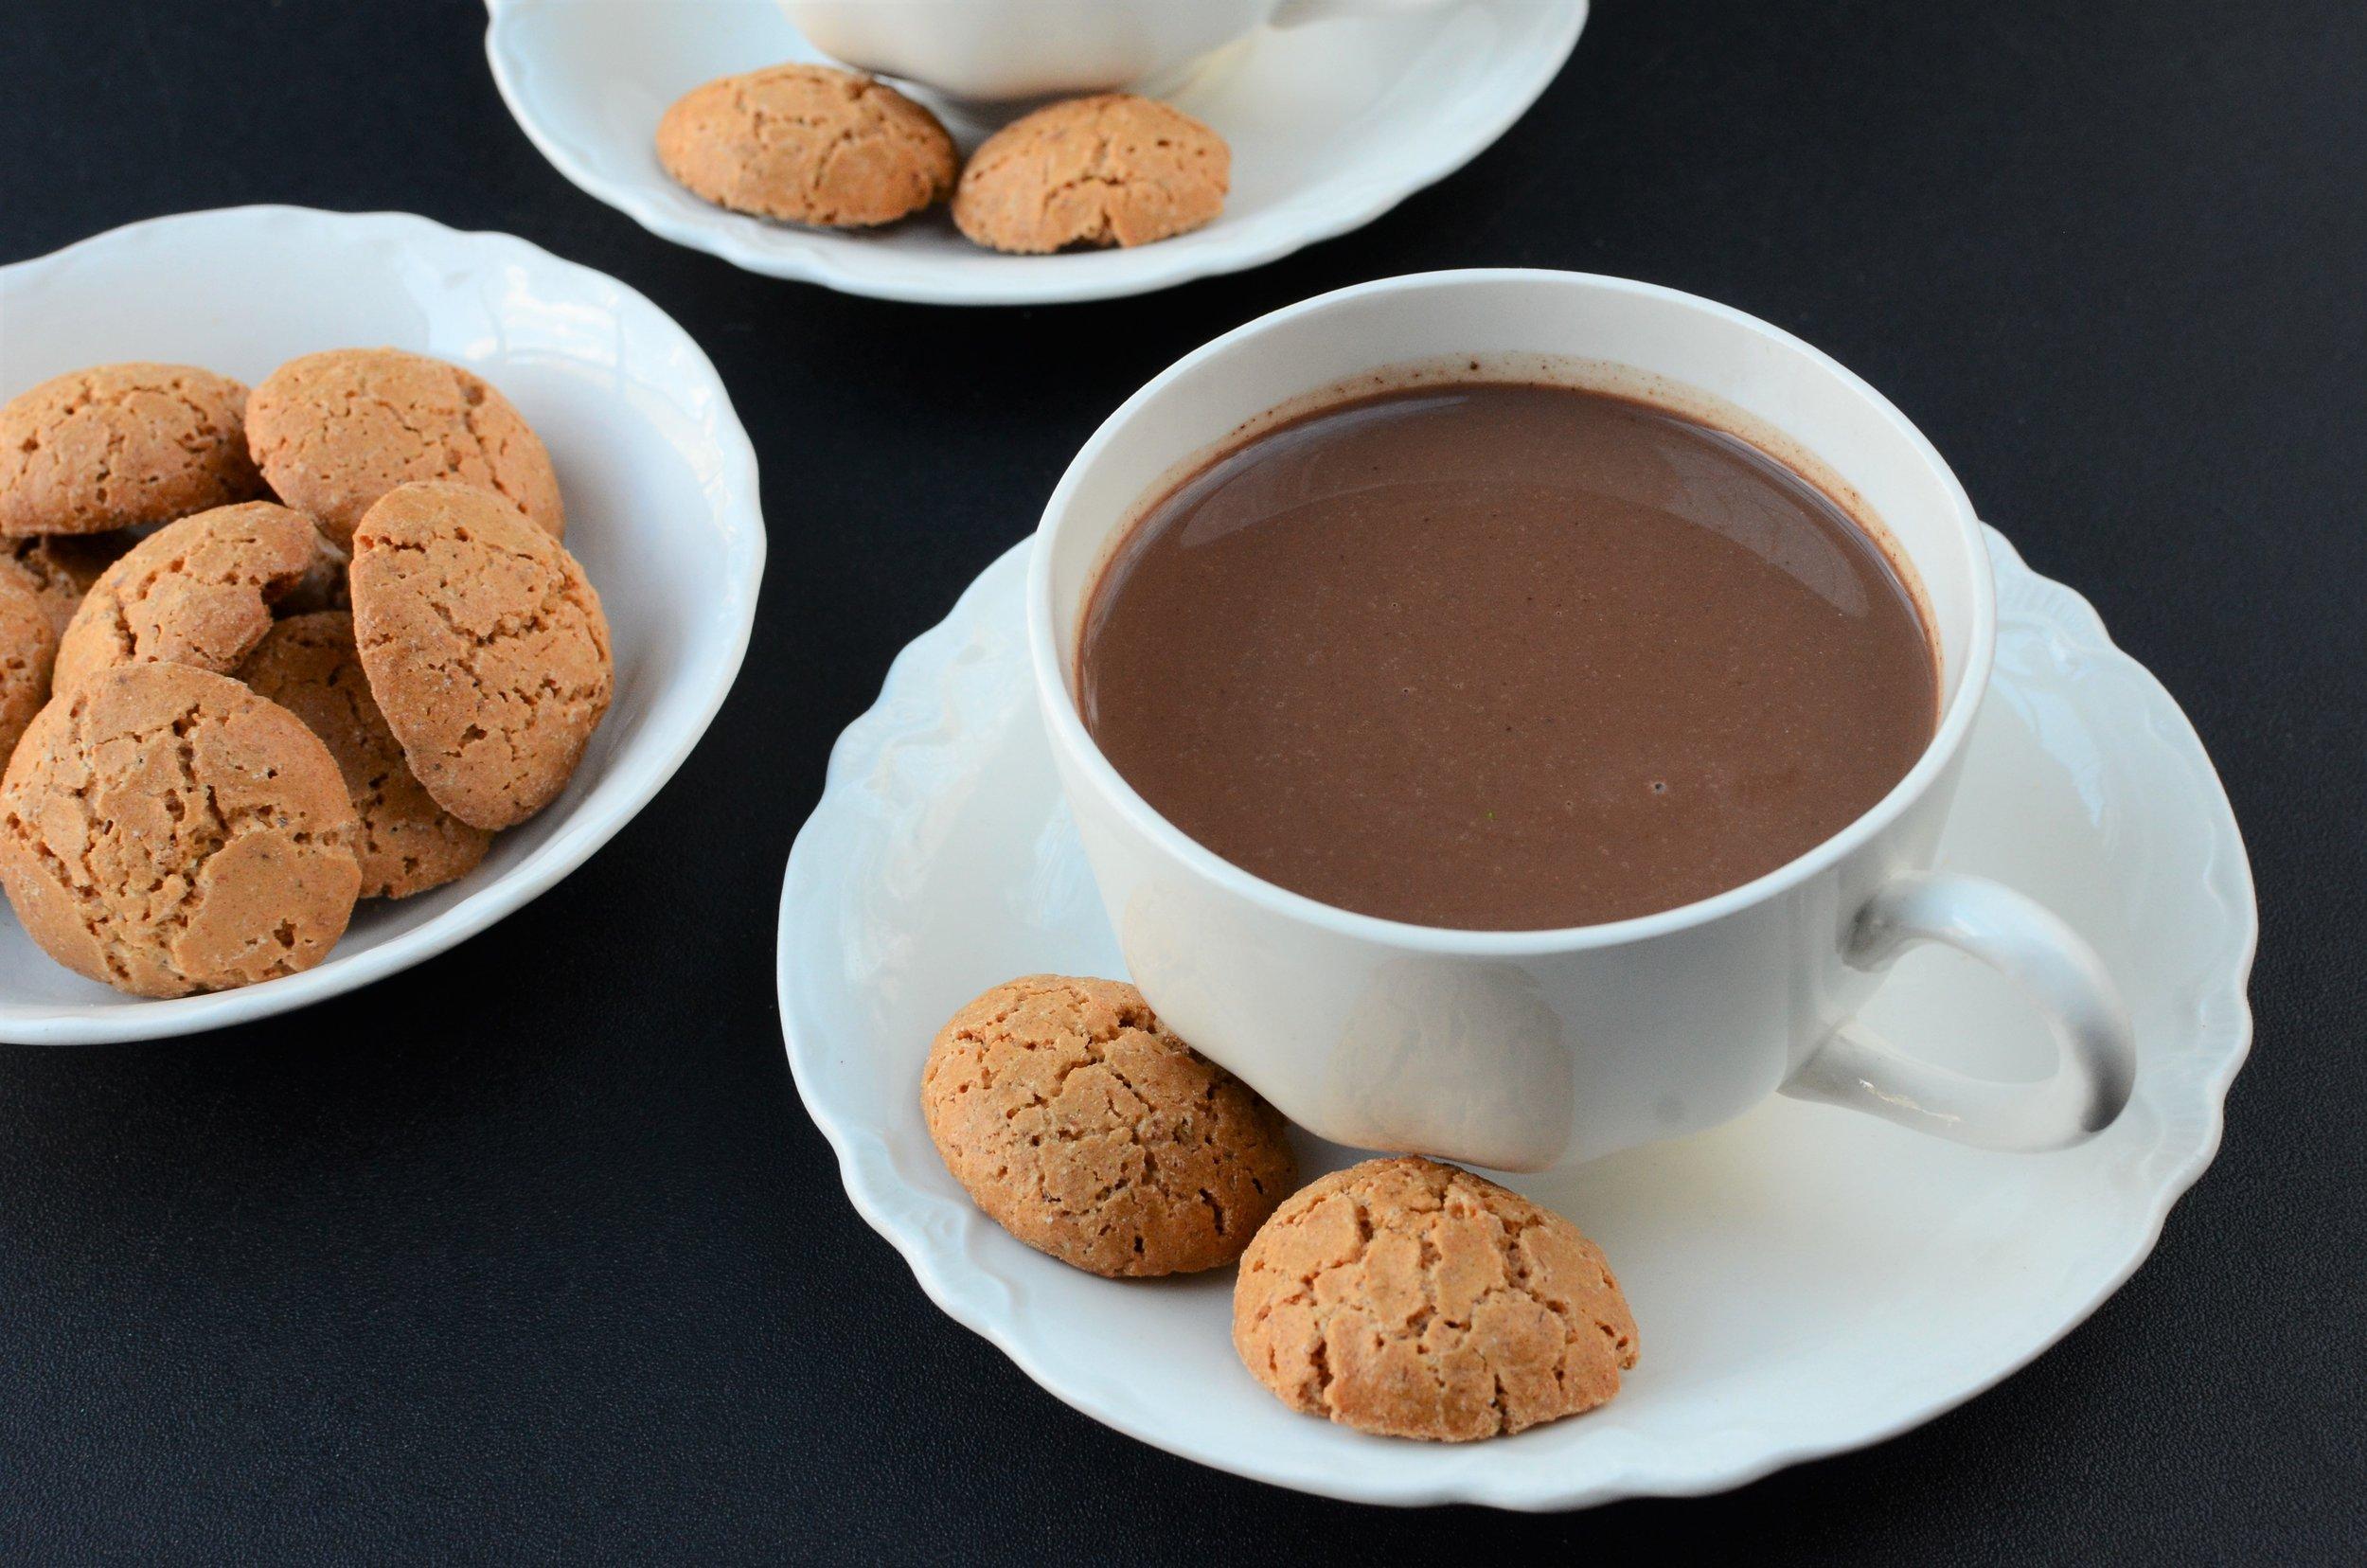 coconut milk hot chocolate recipe - ButterYum